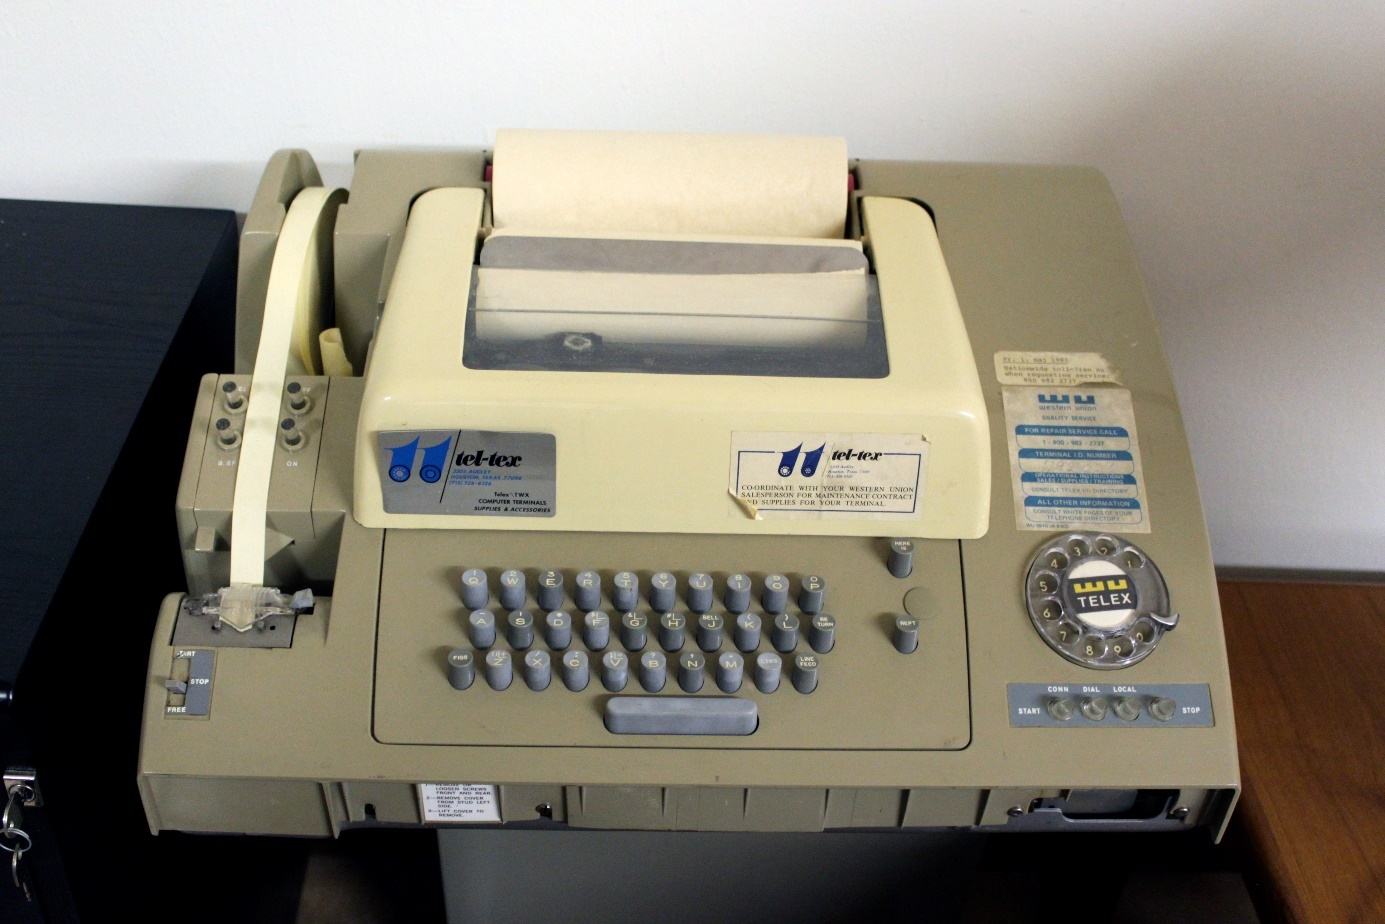 C:\Users\flobo\OneDrive\MSFTStory\Historique\Partie 2\Telex_machine_ASR-32.jpg